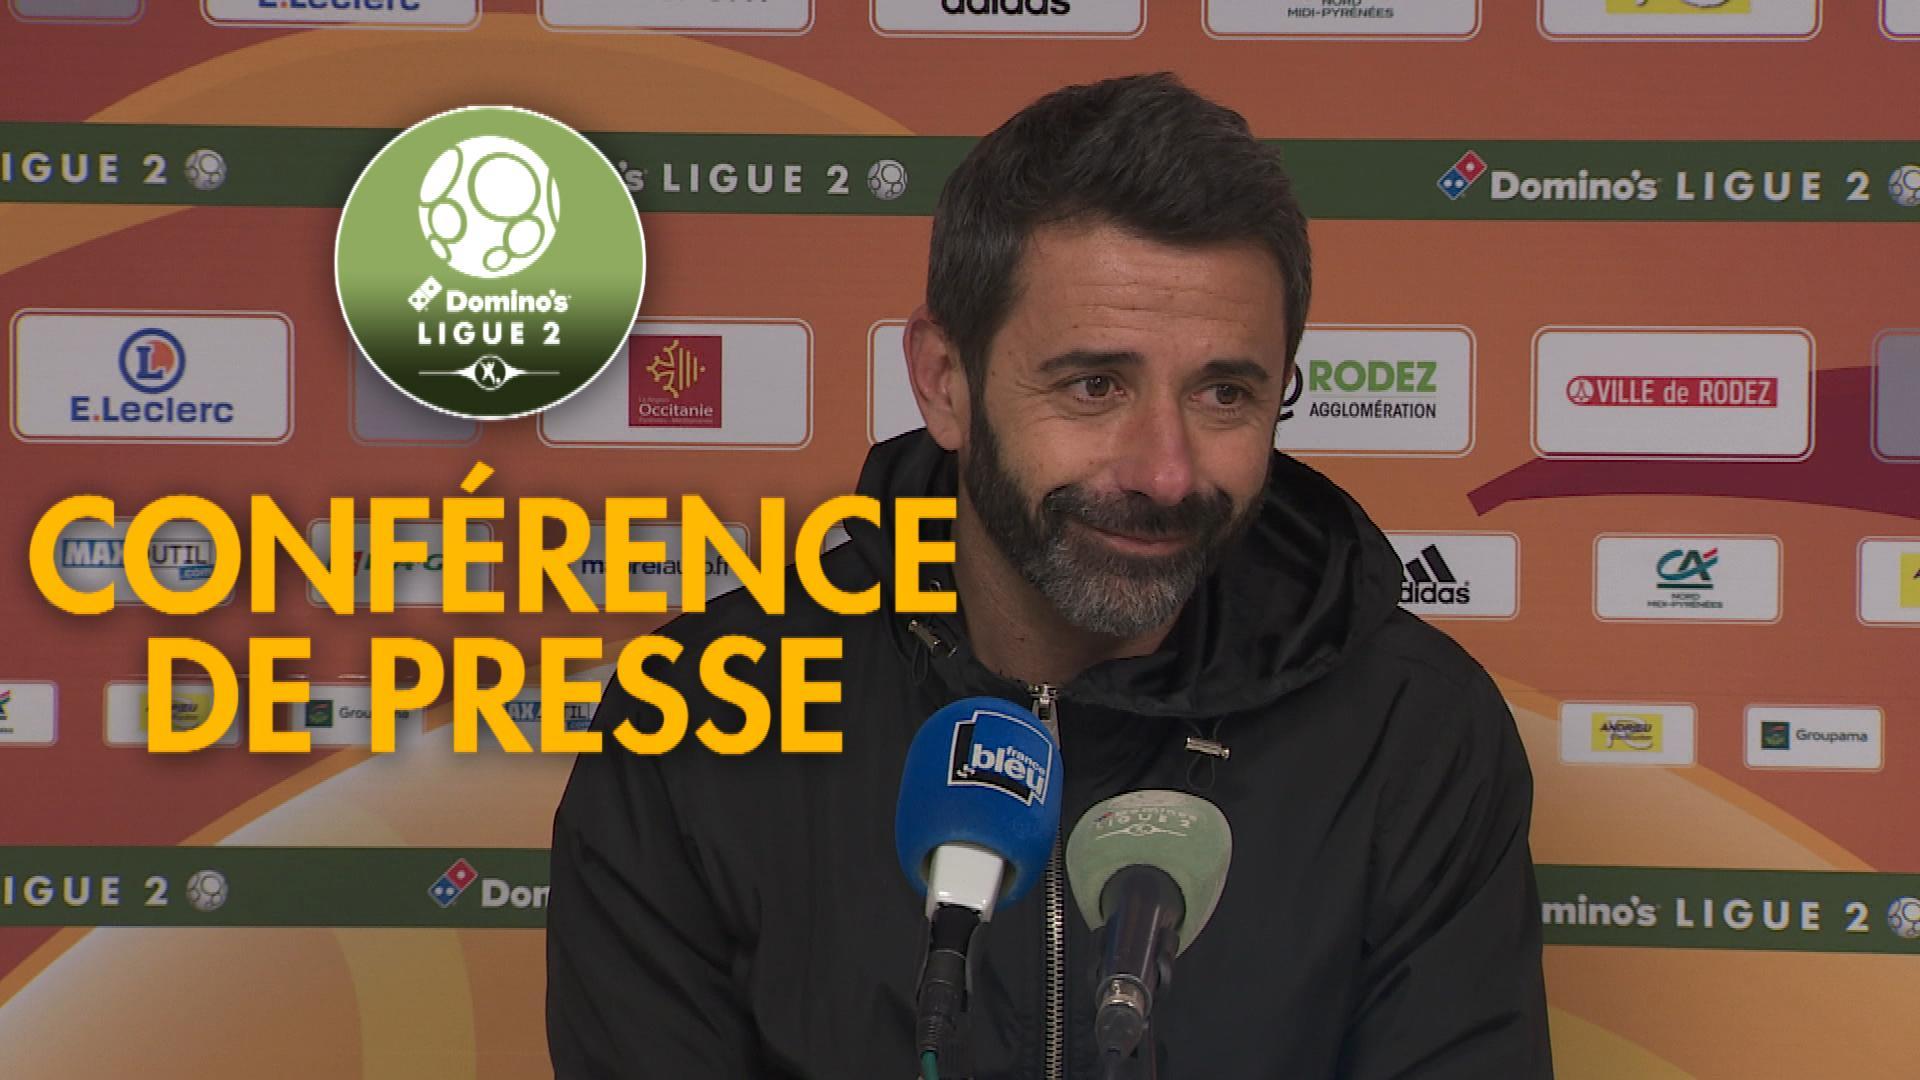 Conférence de presse Rodez Aveyron Football - Châteauroux (1-2) : Laurent PEYRELADE (RAF) - Nicolas USAI (LBC) - 2019/2020